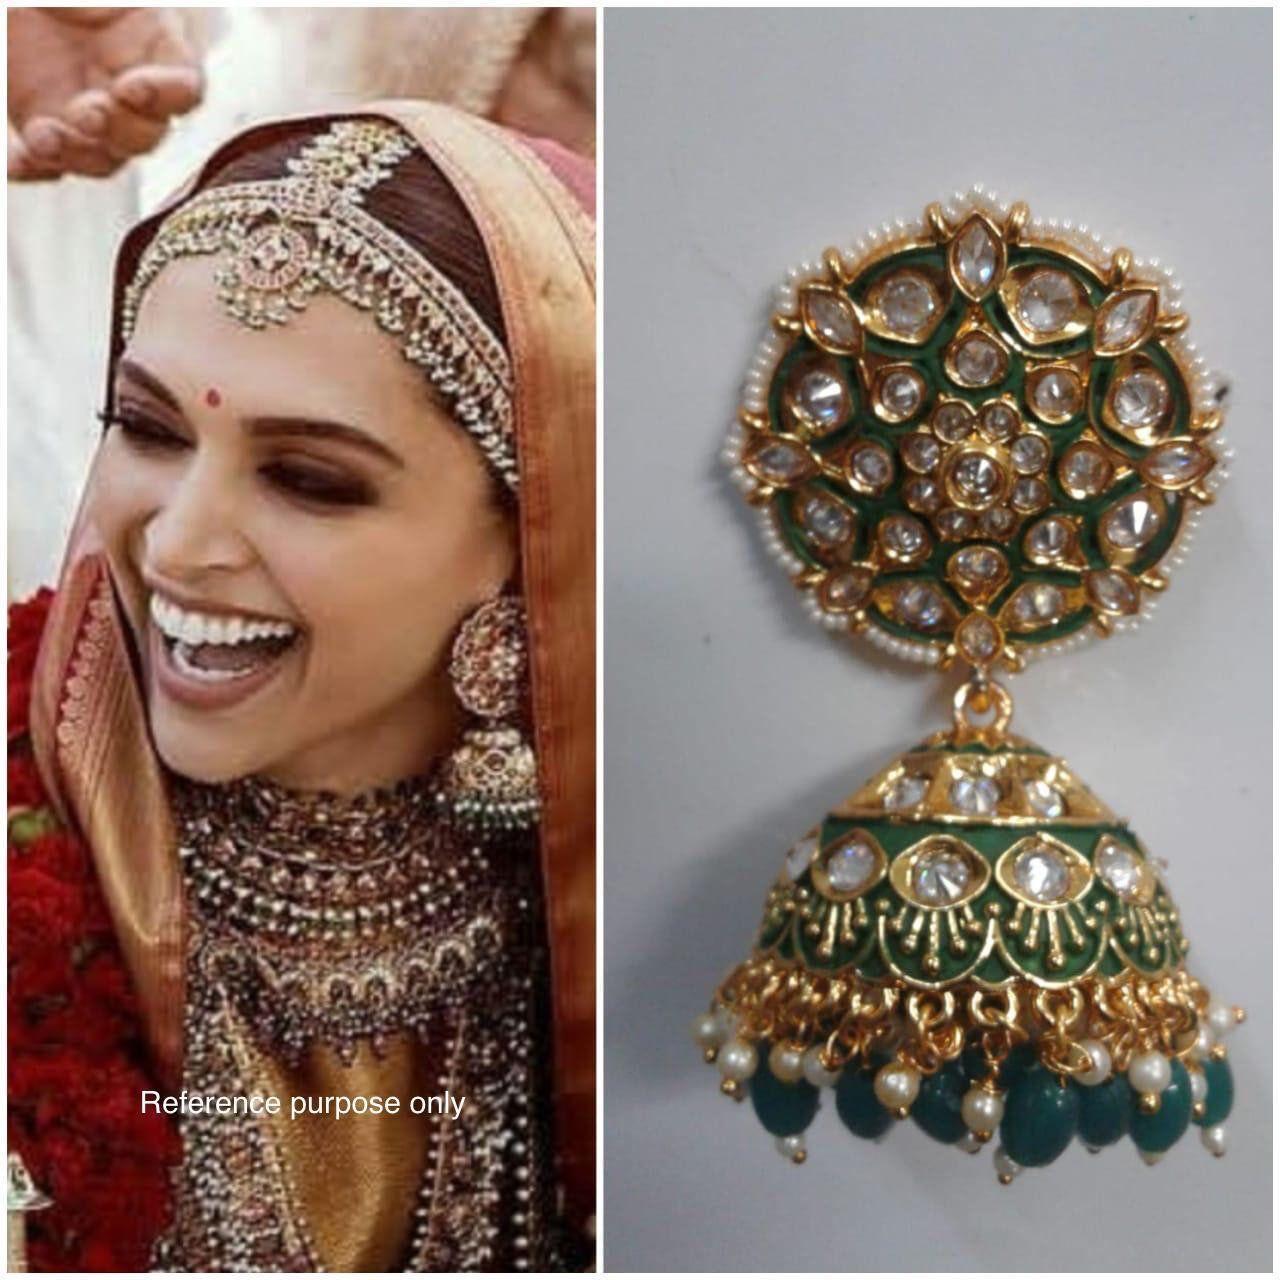 Earrings Silver Erarrings Gold Earrings Jhumka Earrings Traditional Earrings Pearl Earrings Jhumka Earrings Sabyasachi Jewellery Gold Jhumka Earrings